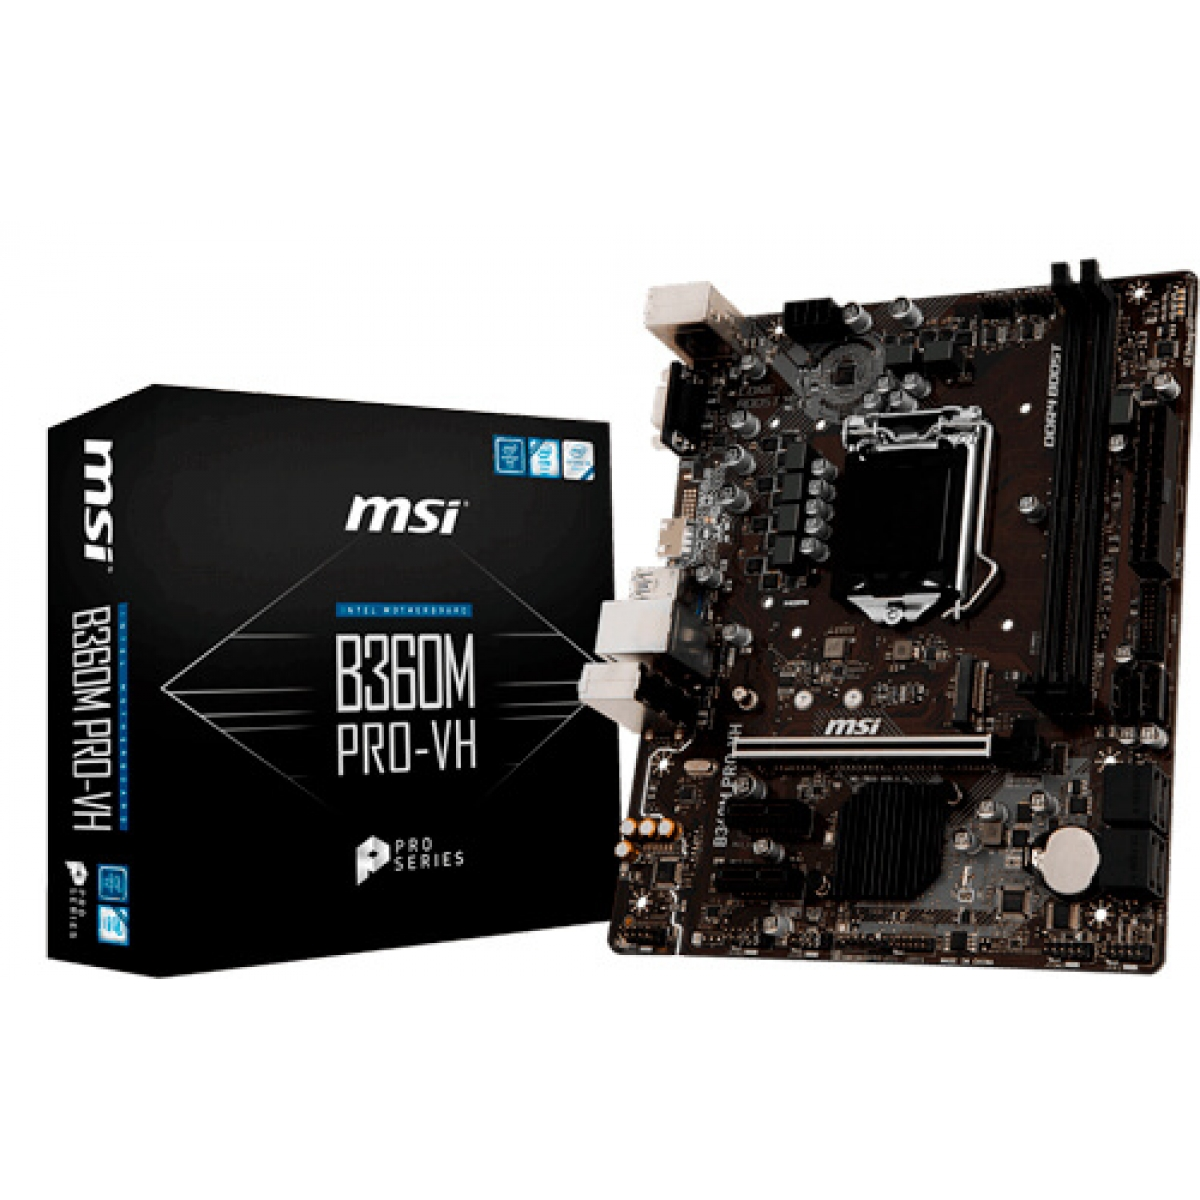 Placa Mãe MSI B360M PRO-VH, Chipset B360, Intel LGA 1151, mATX ,DDR4